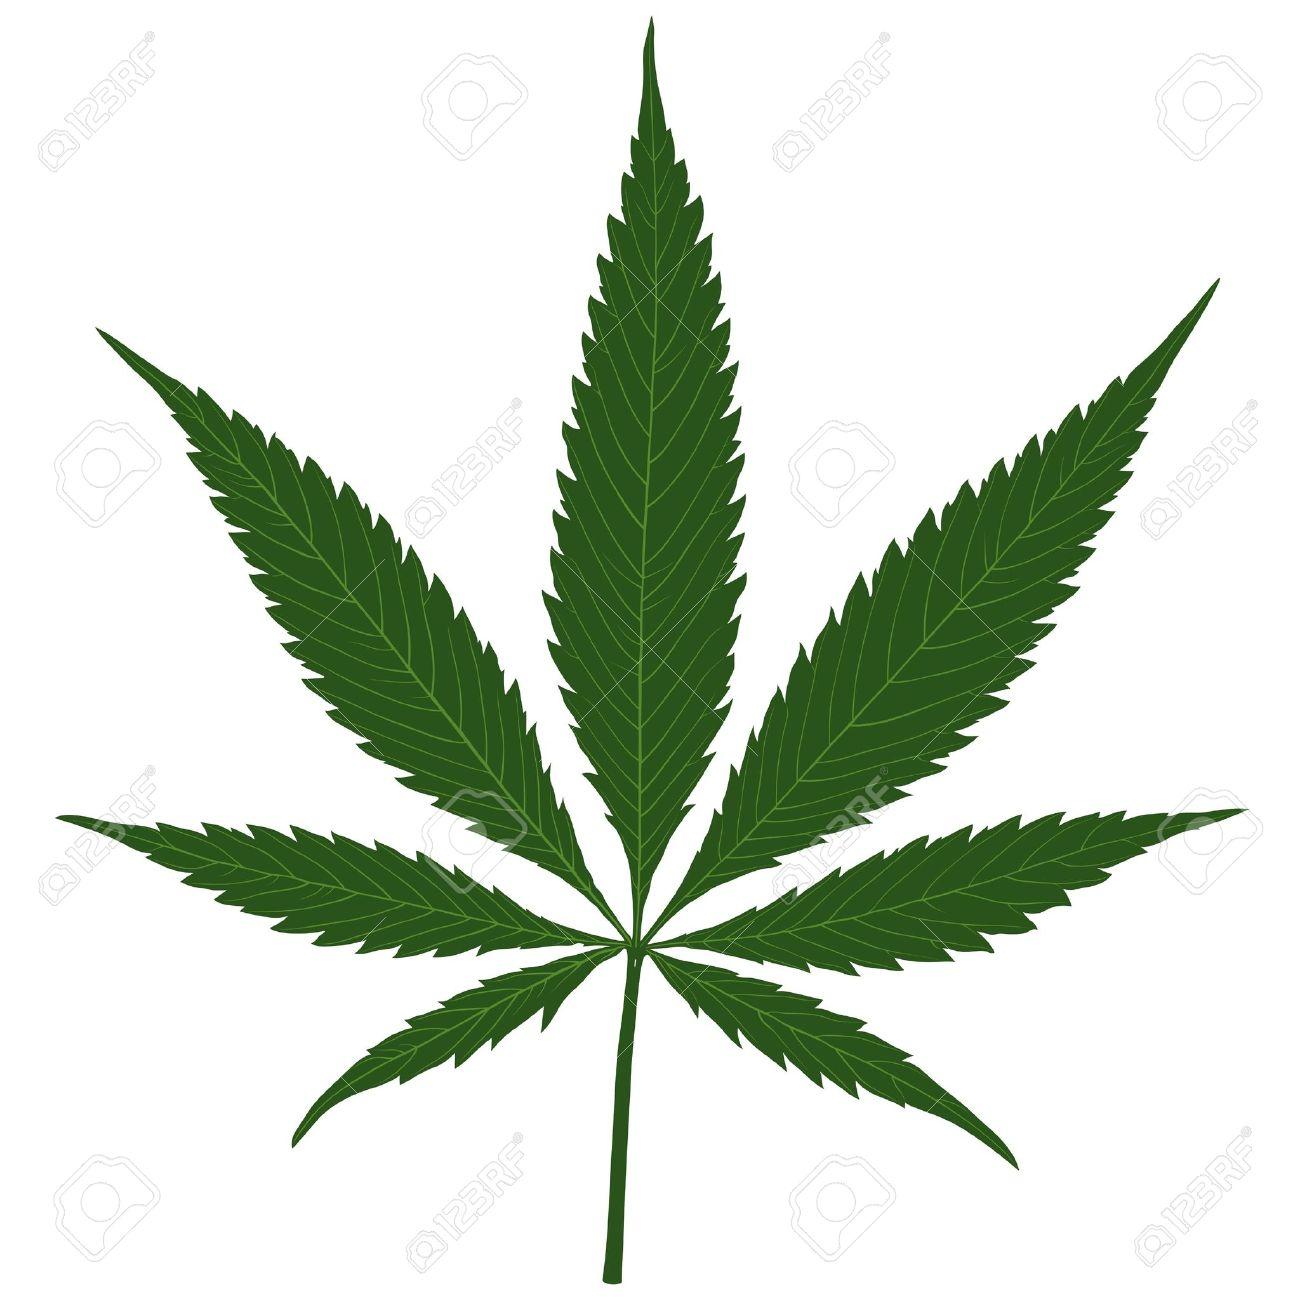 Marijuana (Cannabis) - Hemp leaf illustration Stock Vector - 10277818